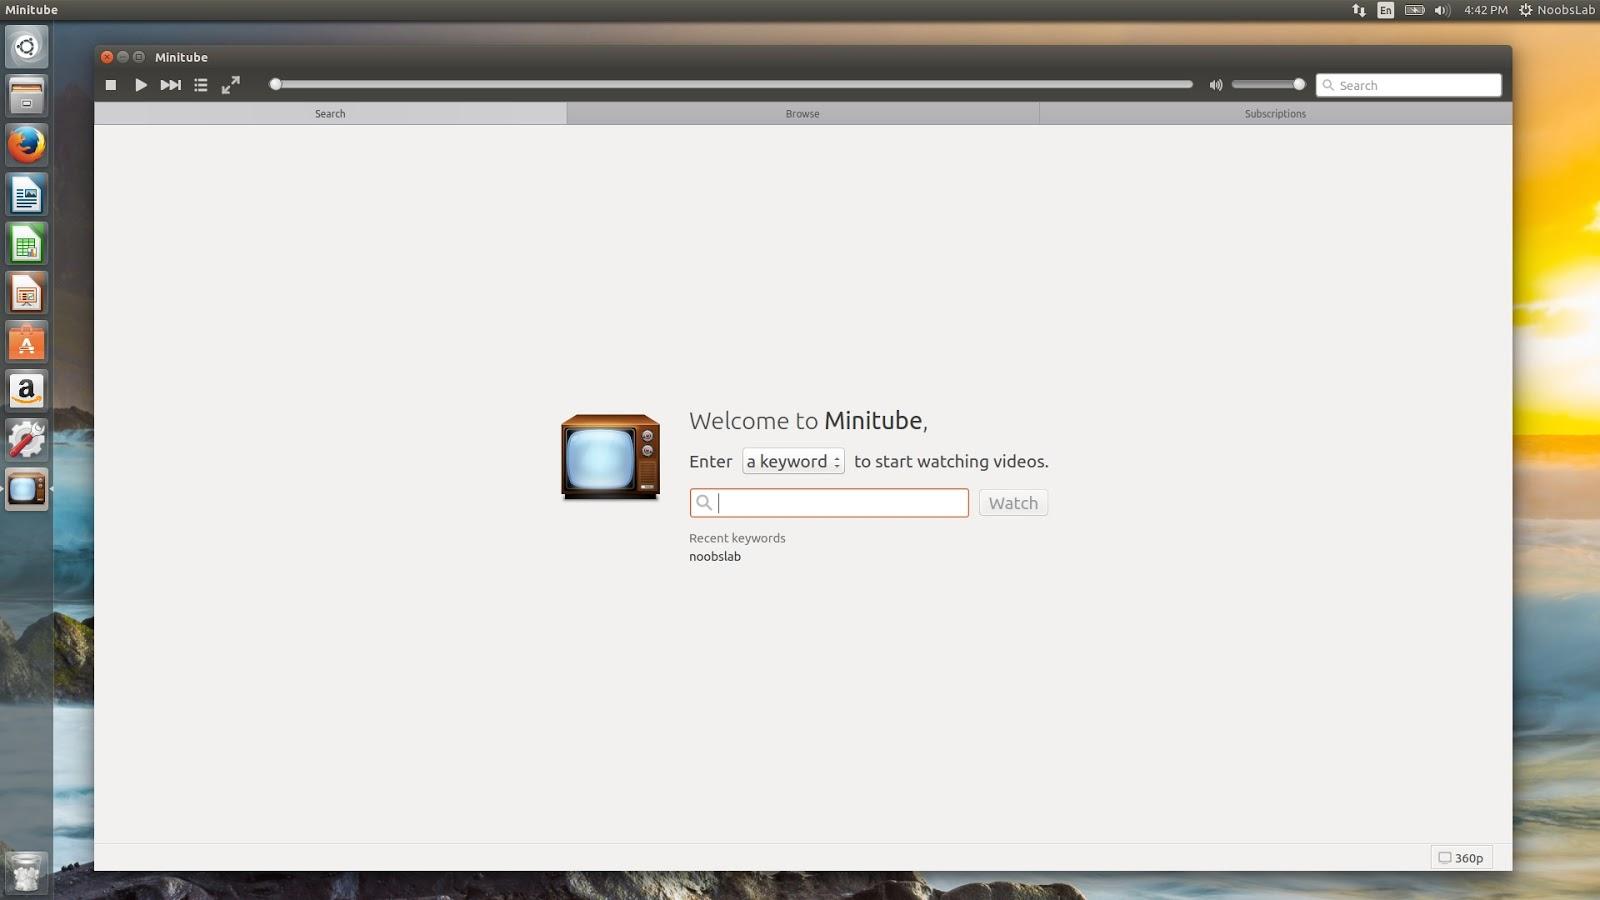 Latest MiniTube 2.5.2 Version Available for Ubuntu/Linux ...